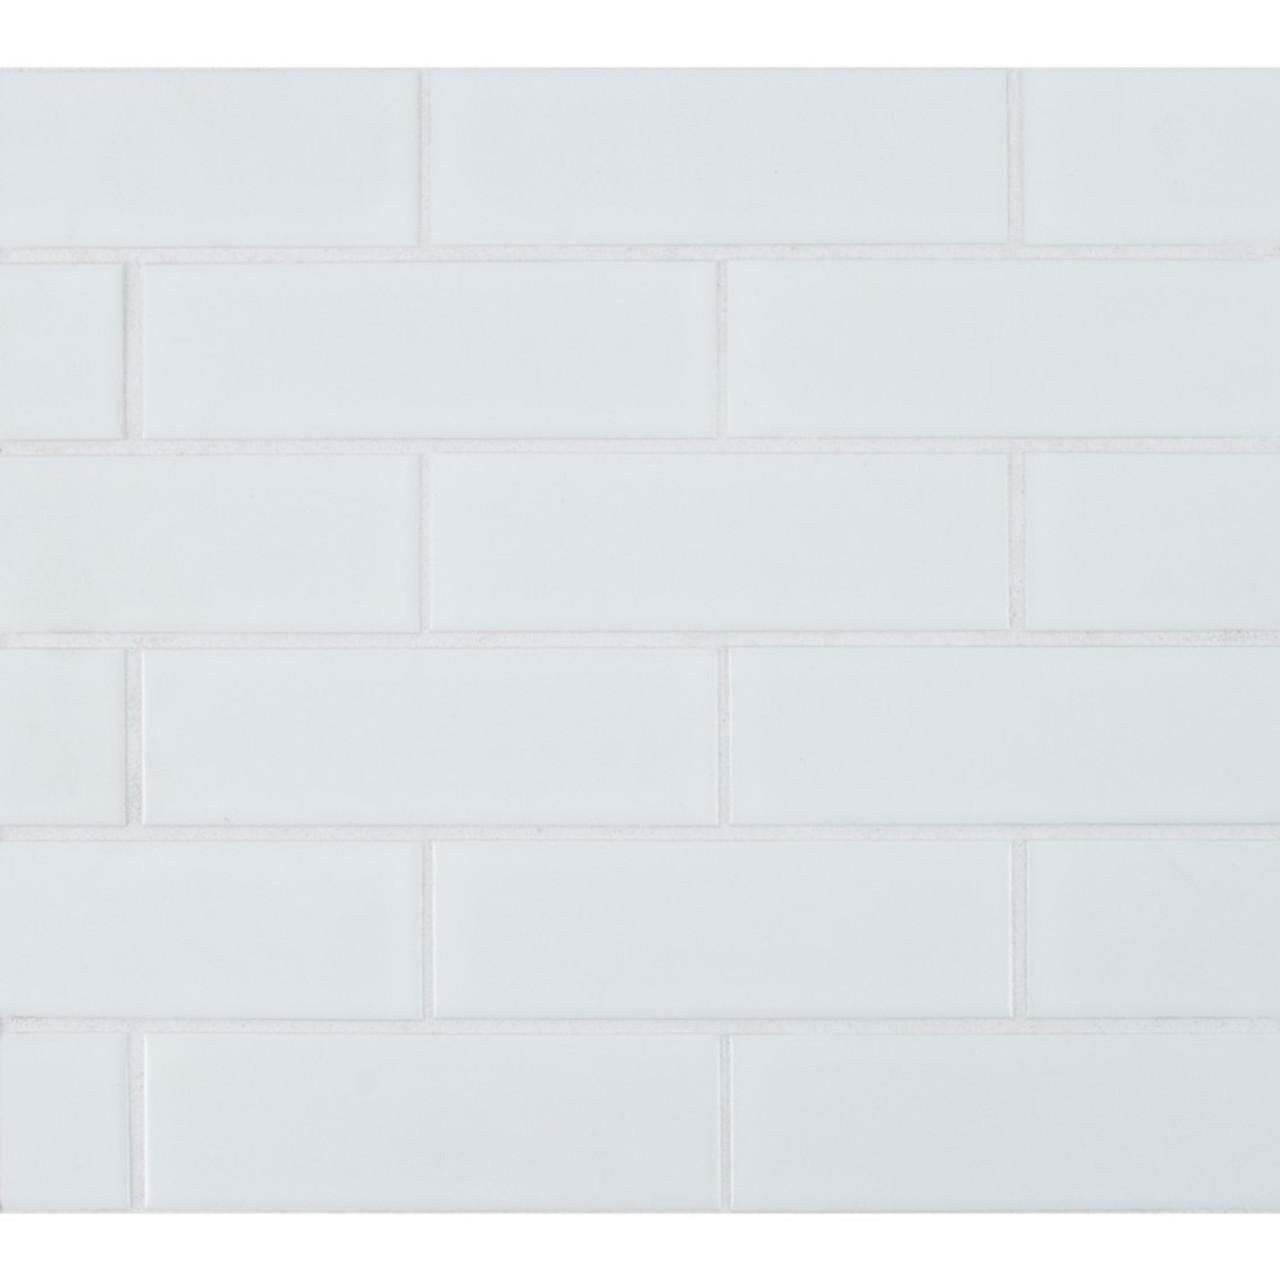 ms international backsplash series retro brick bianco 2x6 matte subway porcelain tile smot pt retbia 2x6